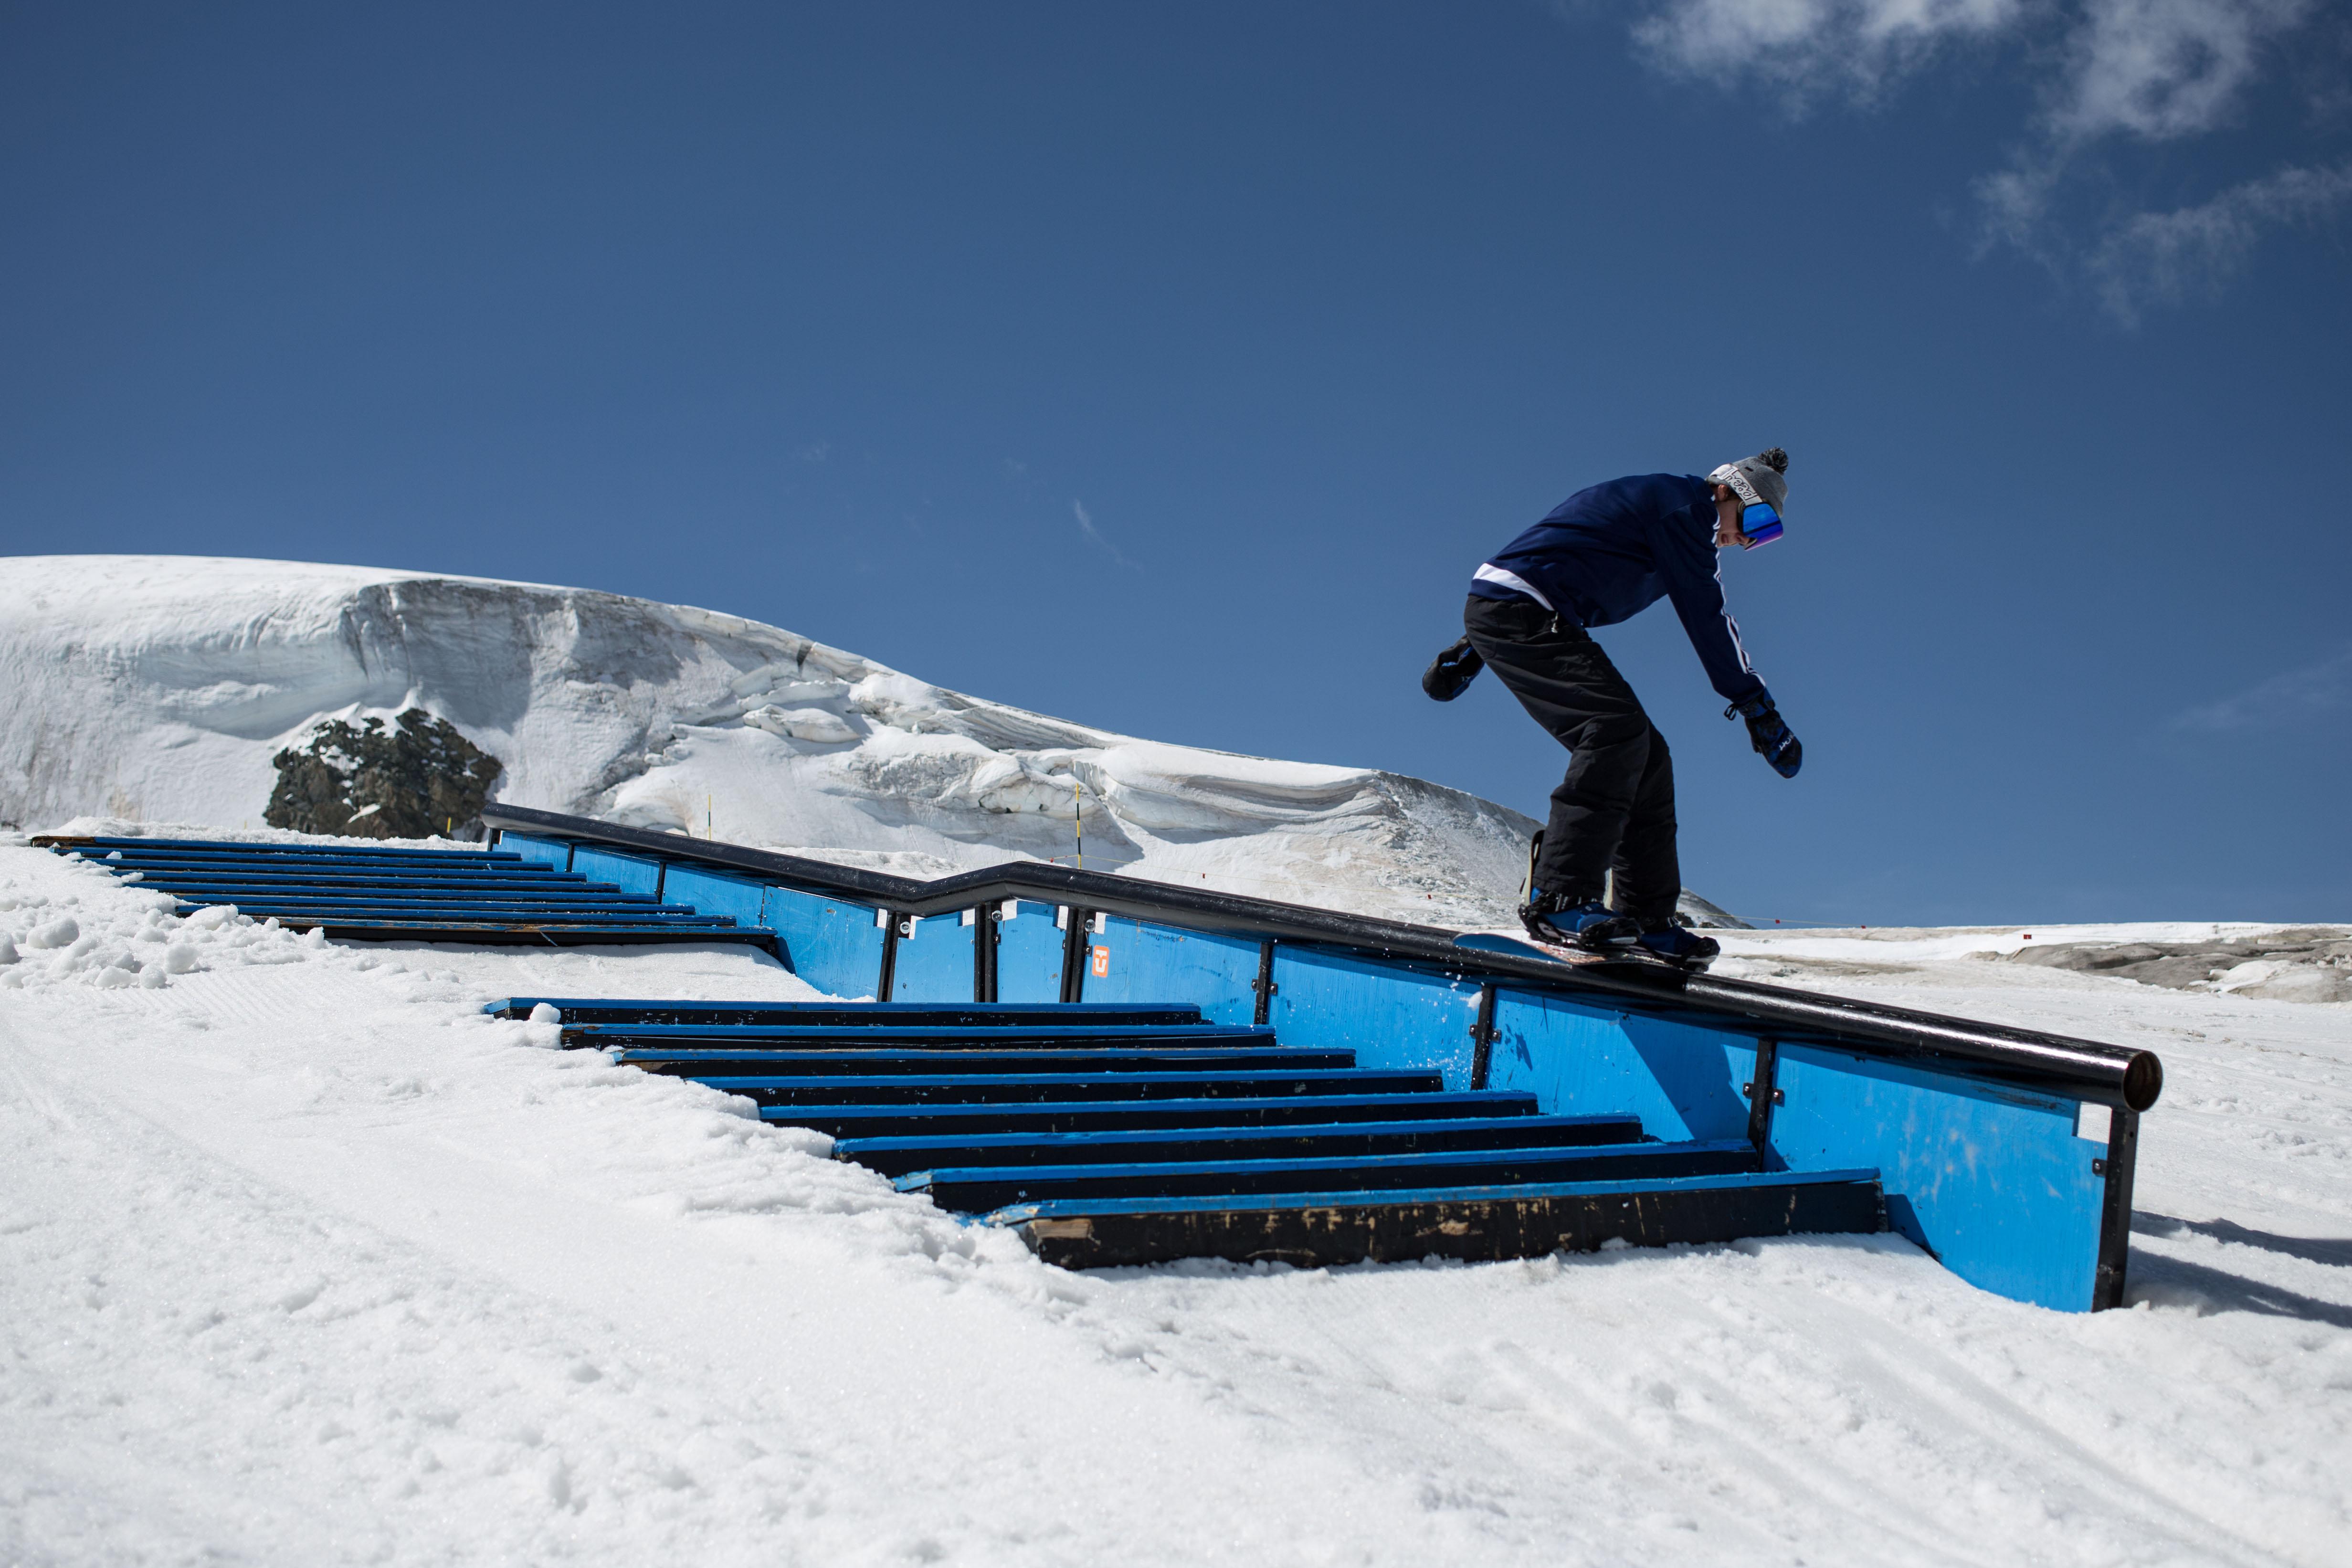 Cédric-Neff_Boardslide_Zermatt_Kuno-Egli